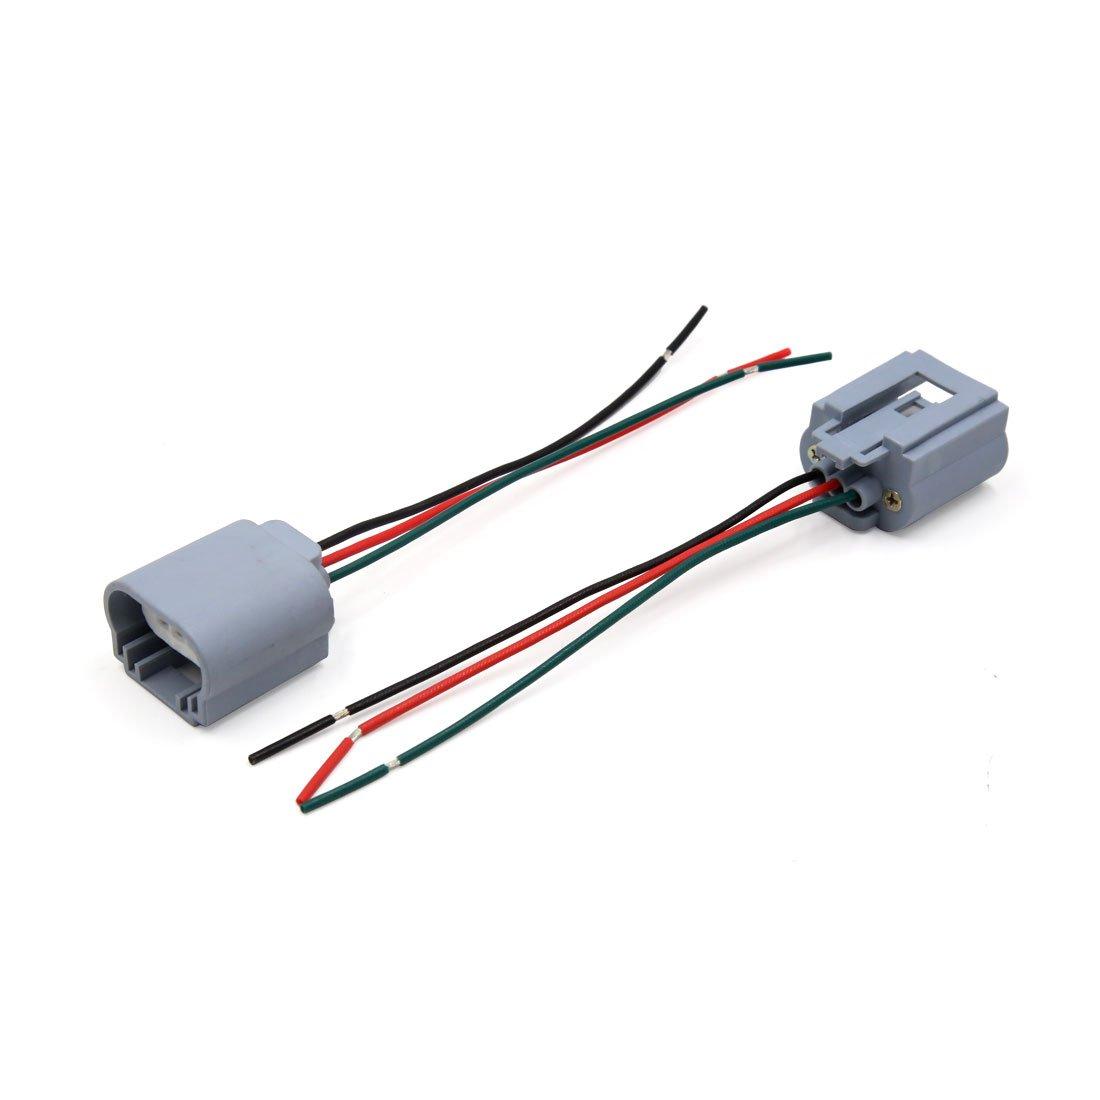 H3 Bulb Wiring | Wiring Diagram Basic H Bulb Wiring Diagram on h4 bulb wiring, h11 bulb wiring, h1 bulb wiring, h10 bulb wiring, h13 bulb wiring, d1 bulb wiring, h7 bulb wiring,